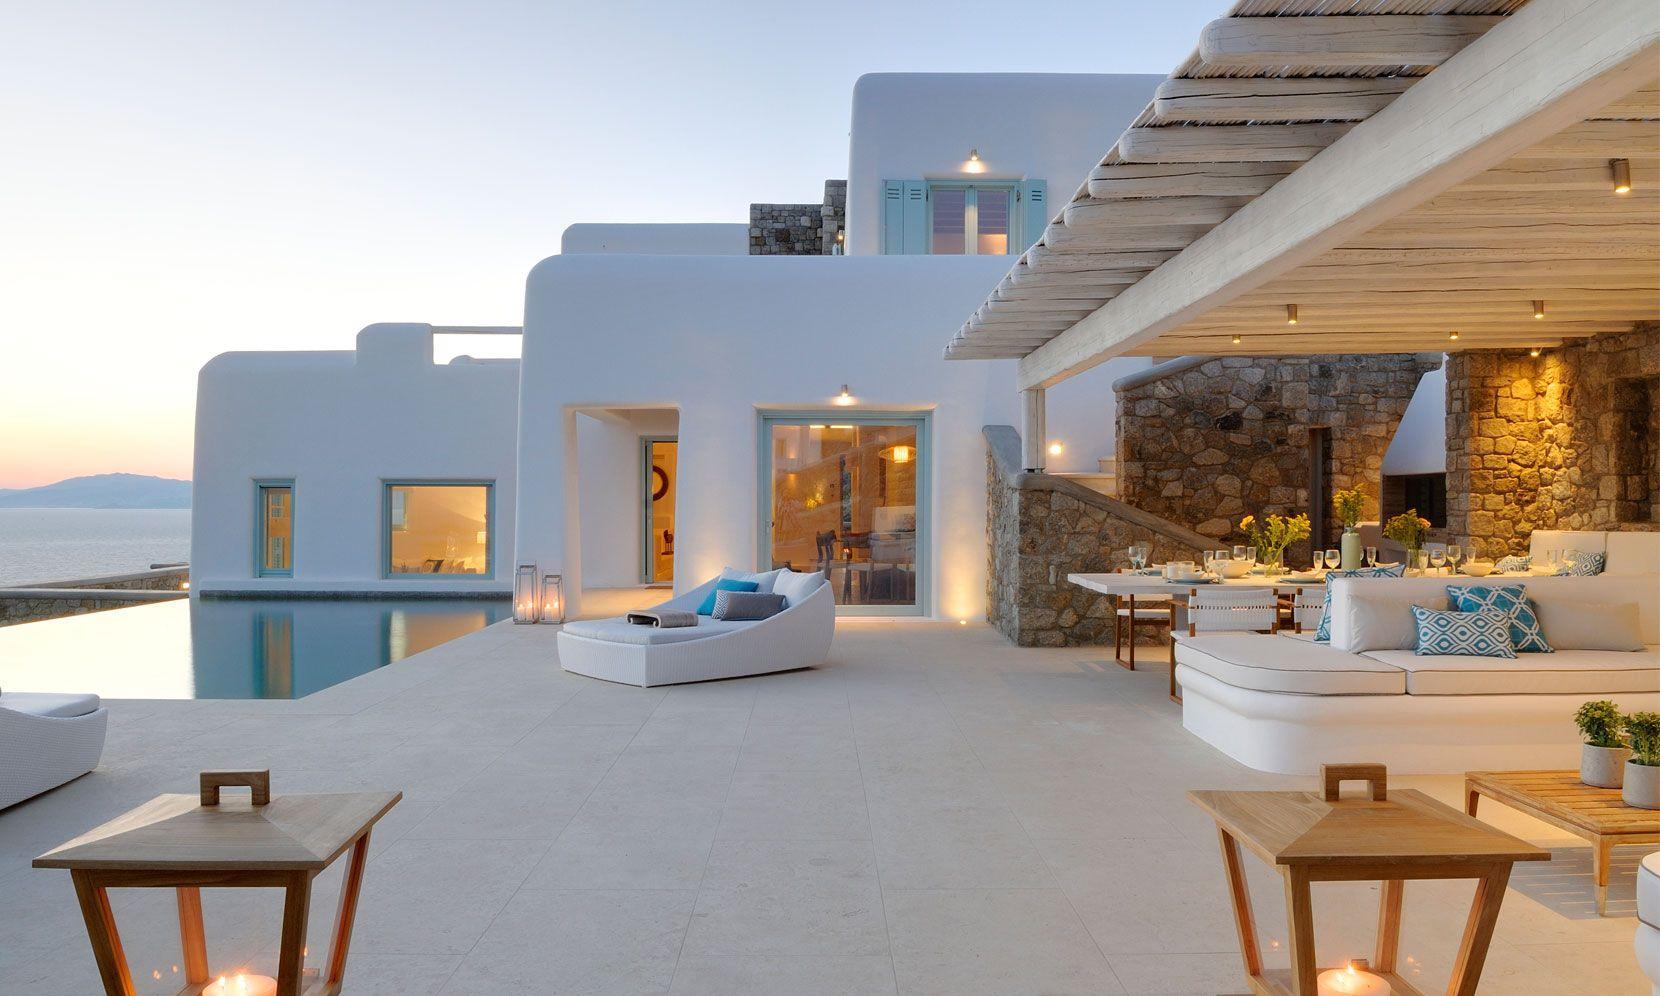 Mykonos Villa Infinity I jumbotron image